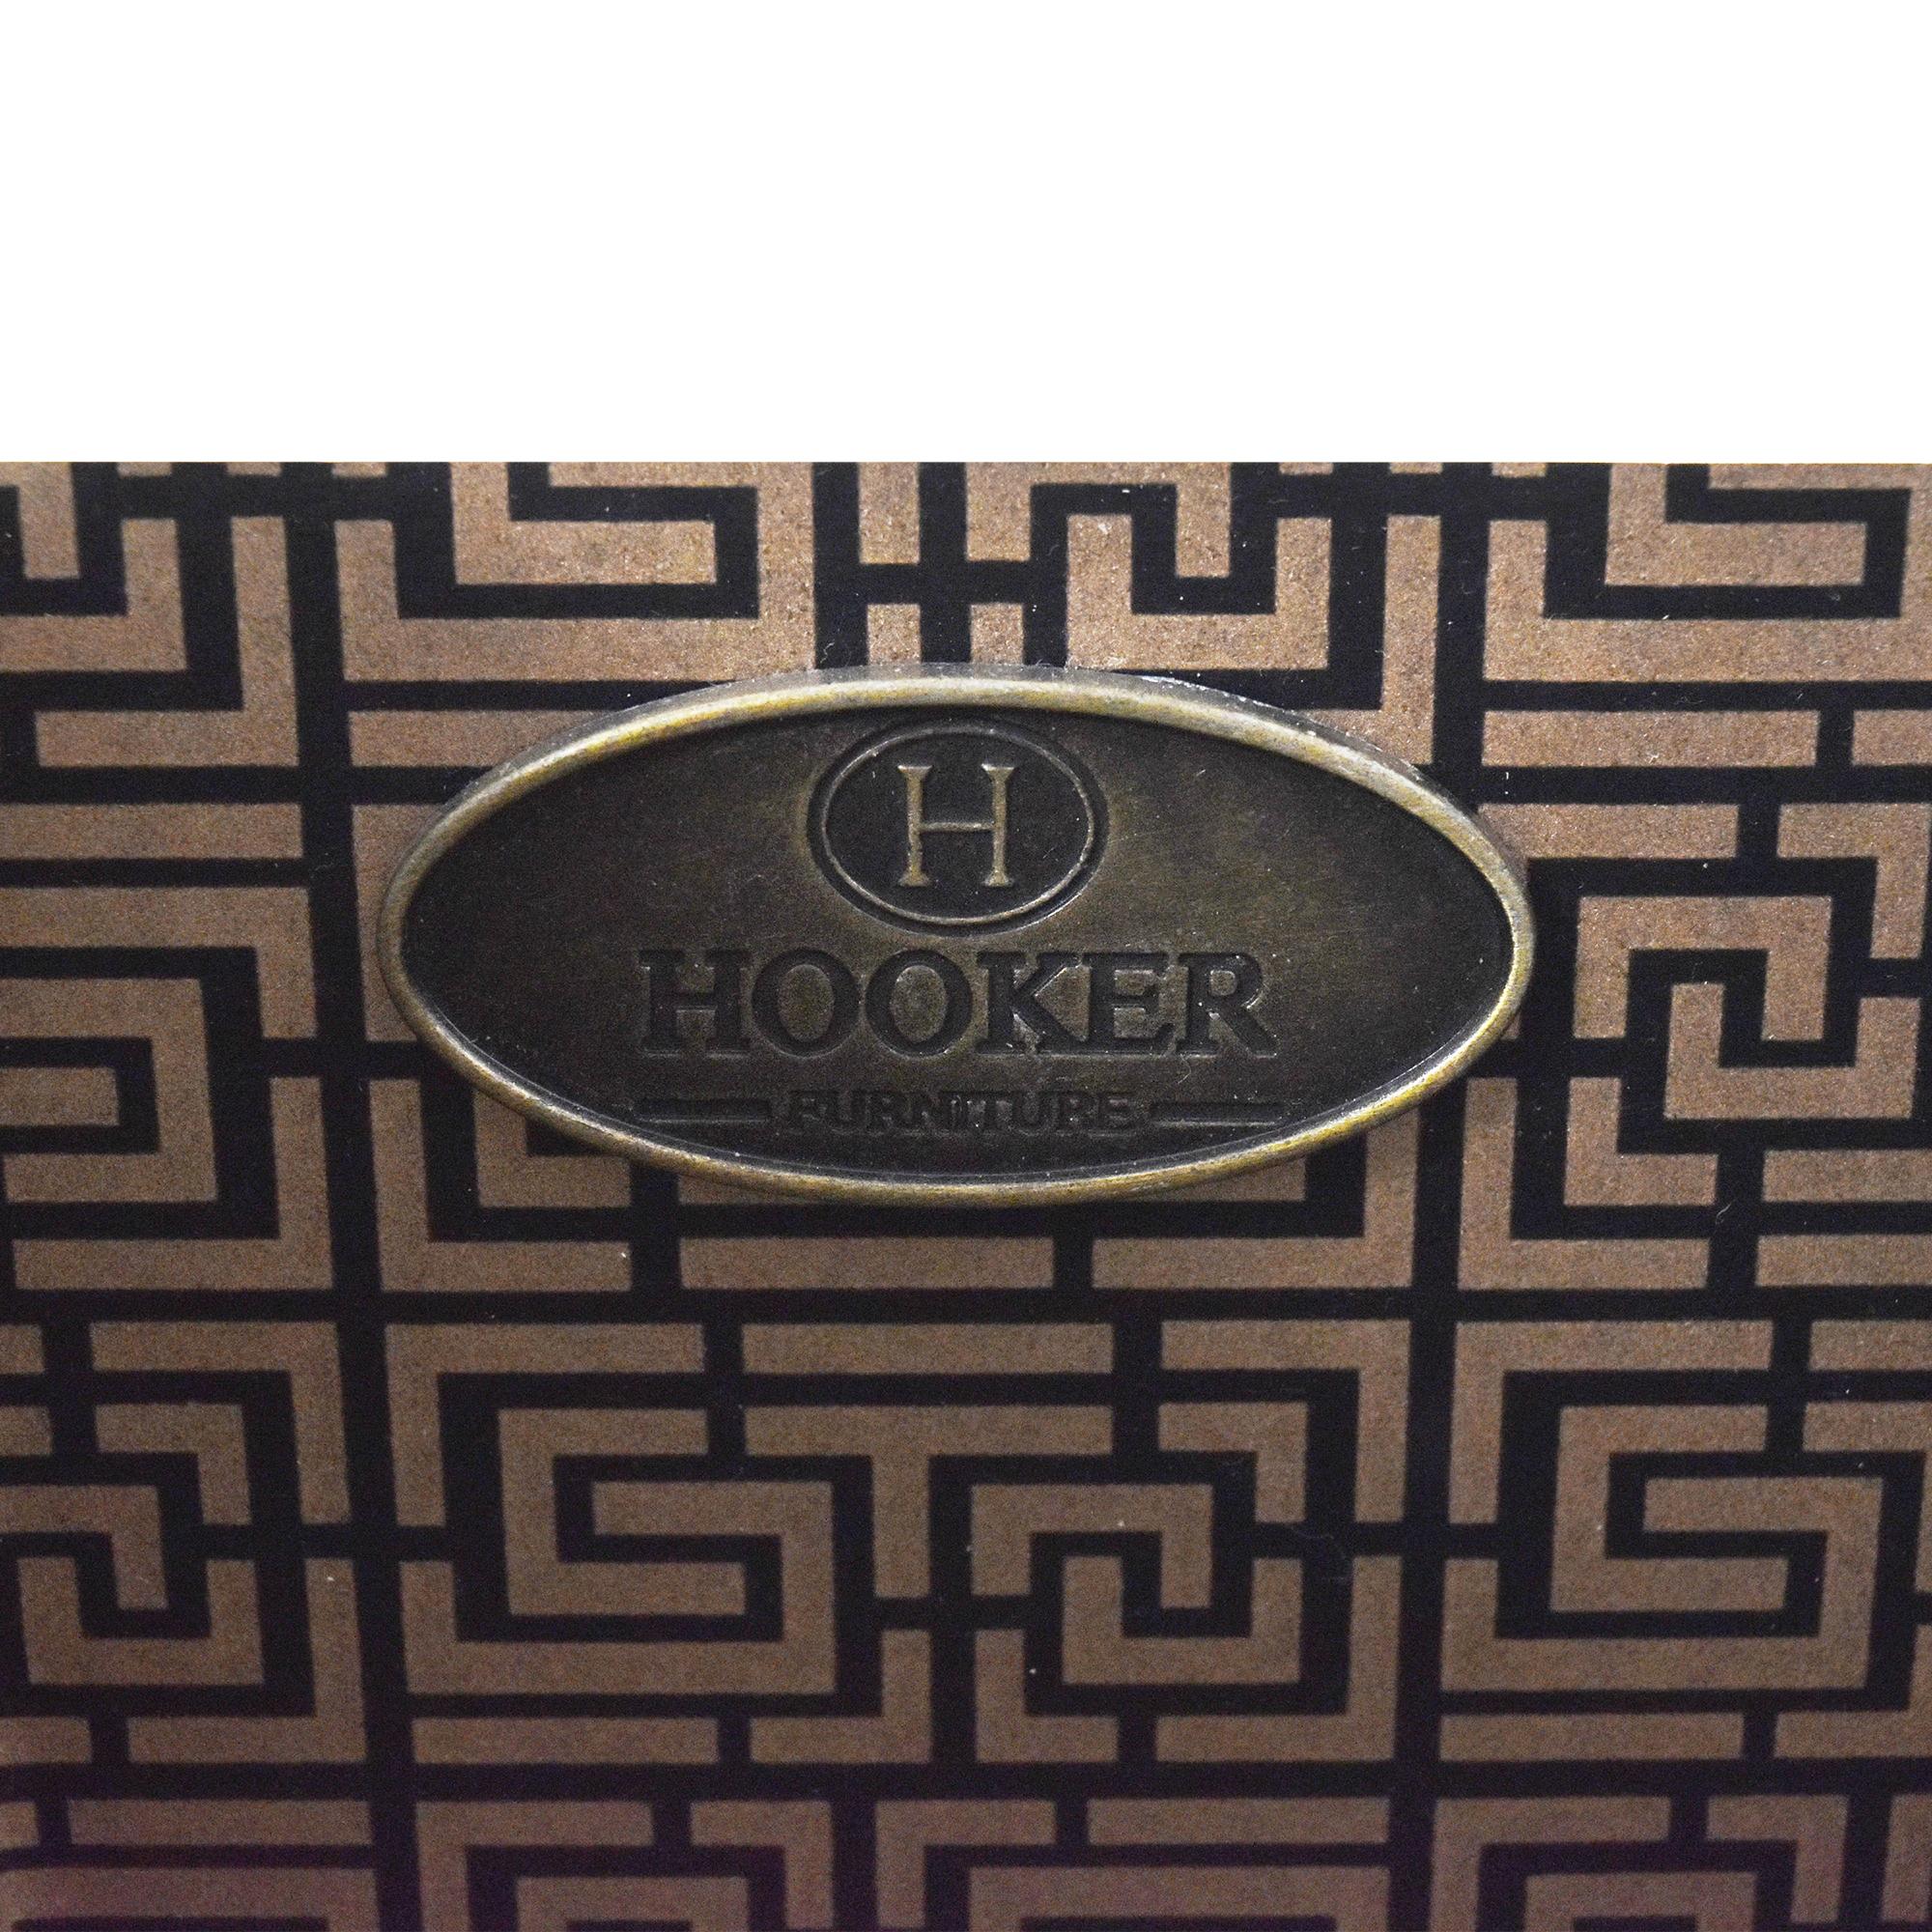 Hooker Furniture Hooker Furniture Melange Lady in White Console Table used